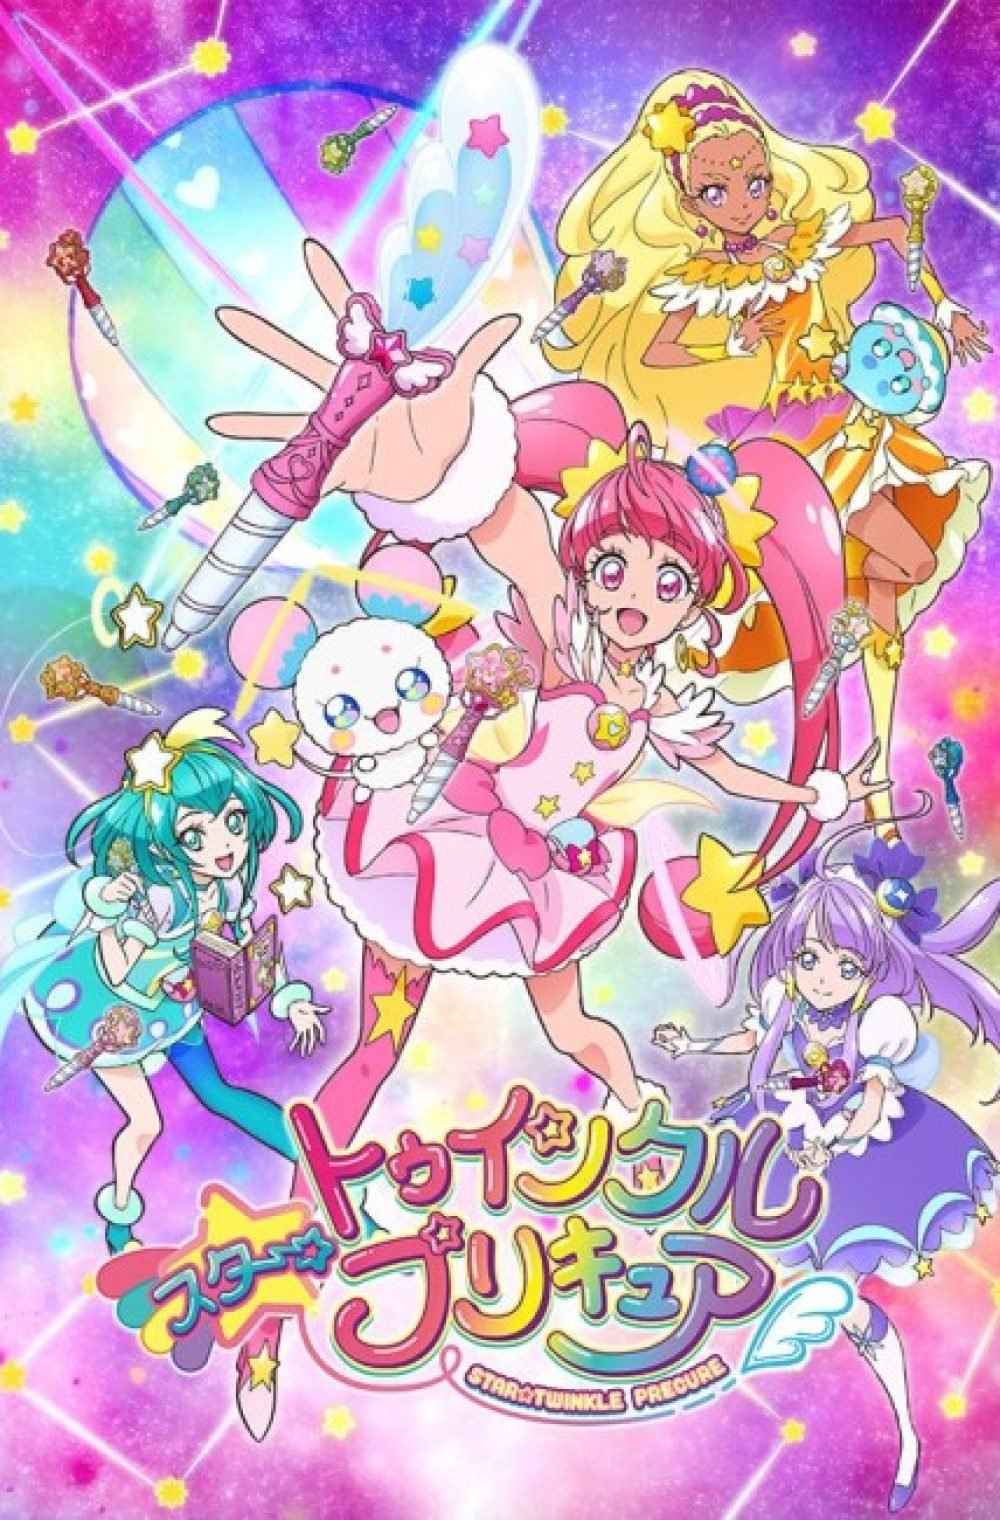 Star ☆ Twinkle Precure